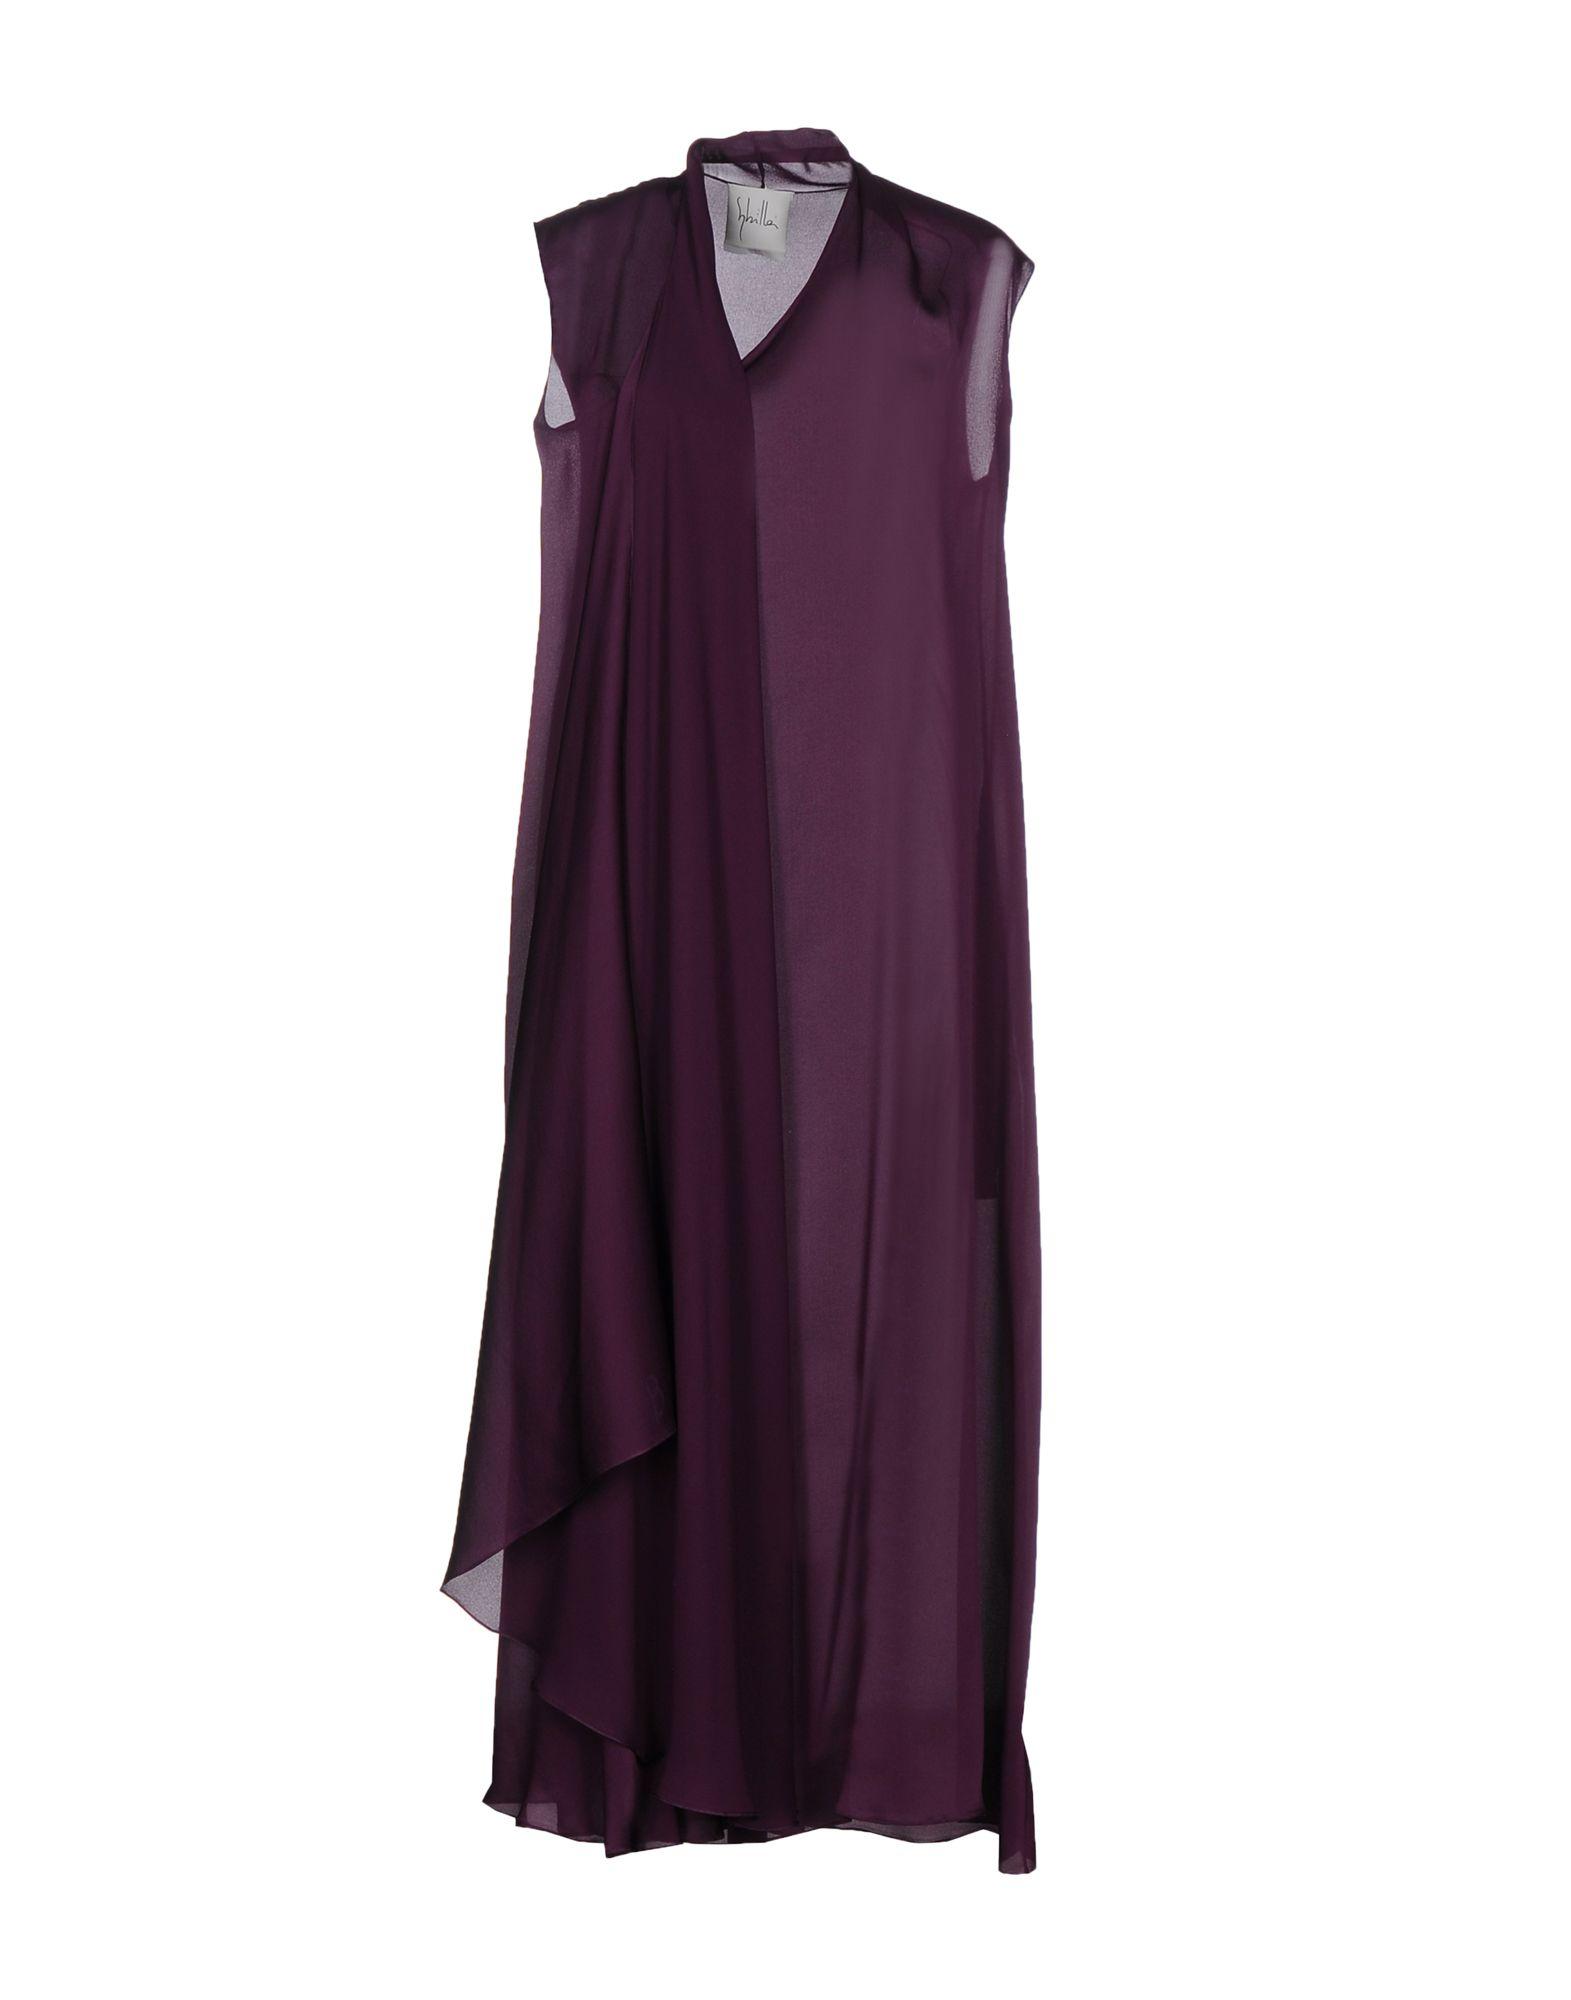 SYBILLA Платье длиной 3/4 lisa corti платье длиной 3 4